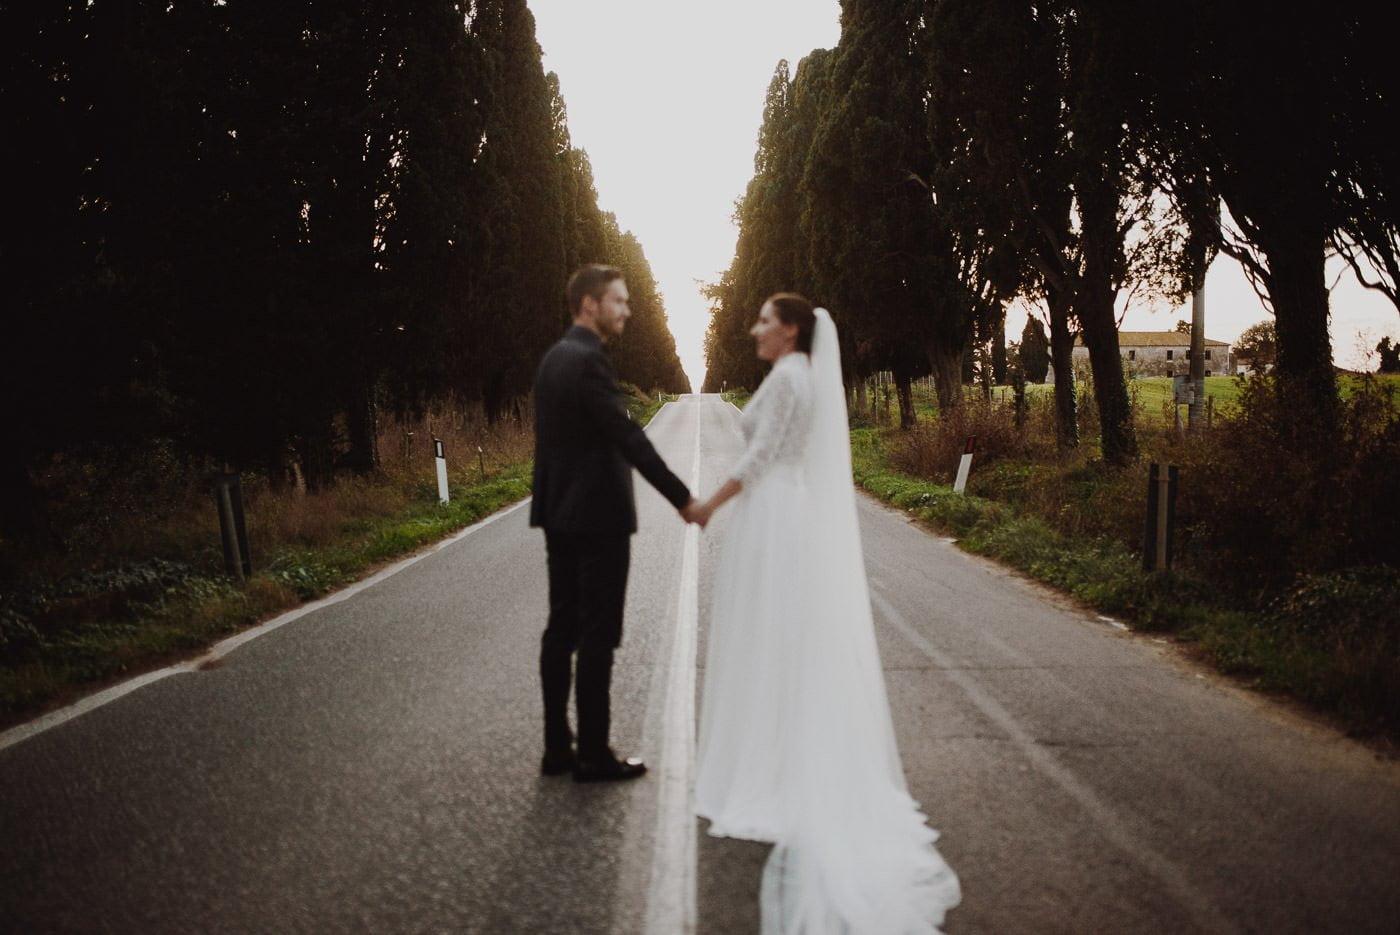 Matrimonio Giulia & Alessandro 28_12 – Alessio Nobili Photographer-37